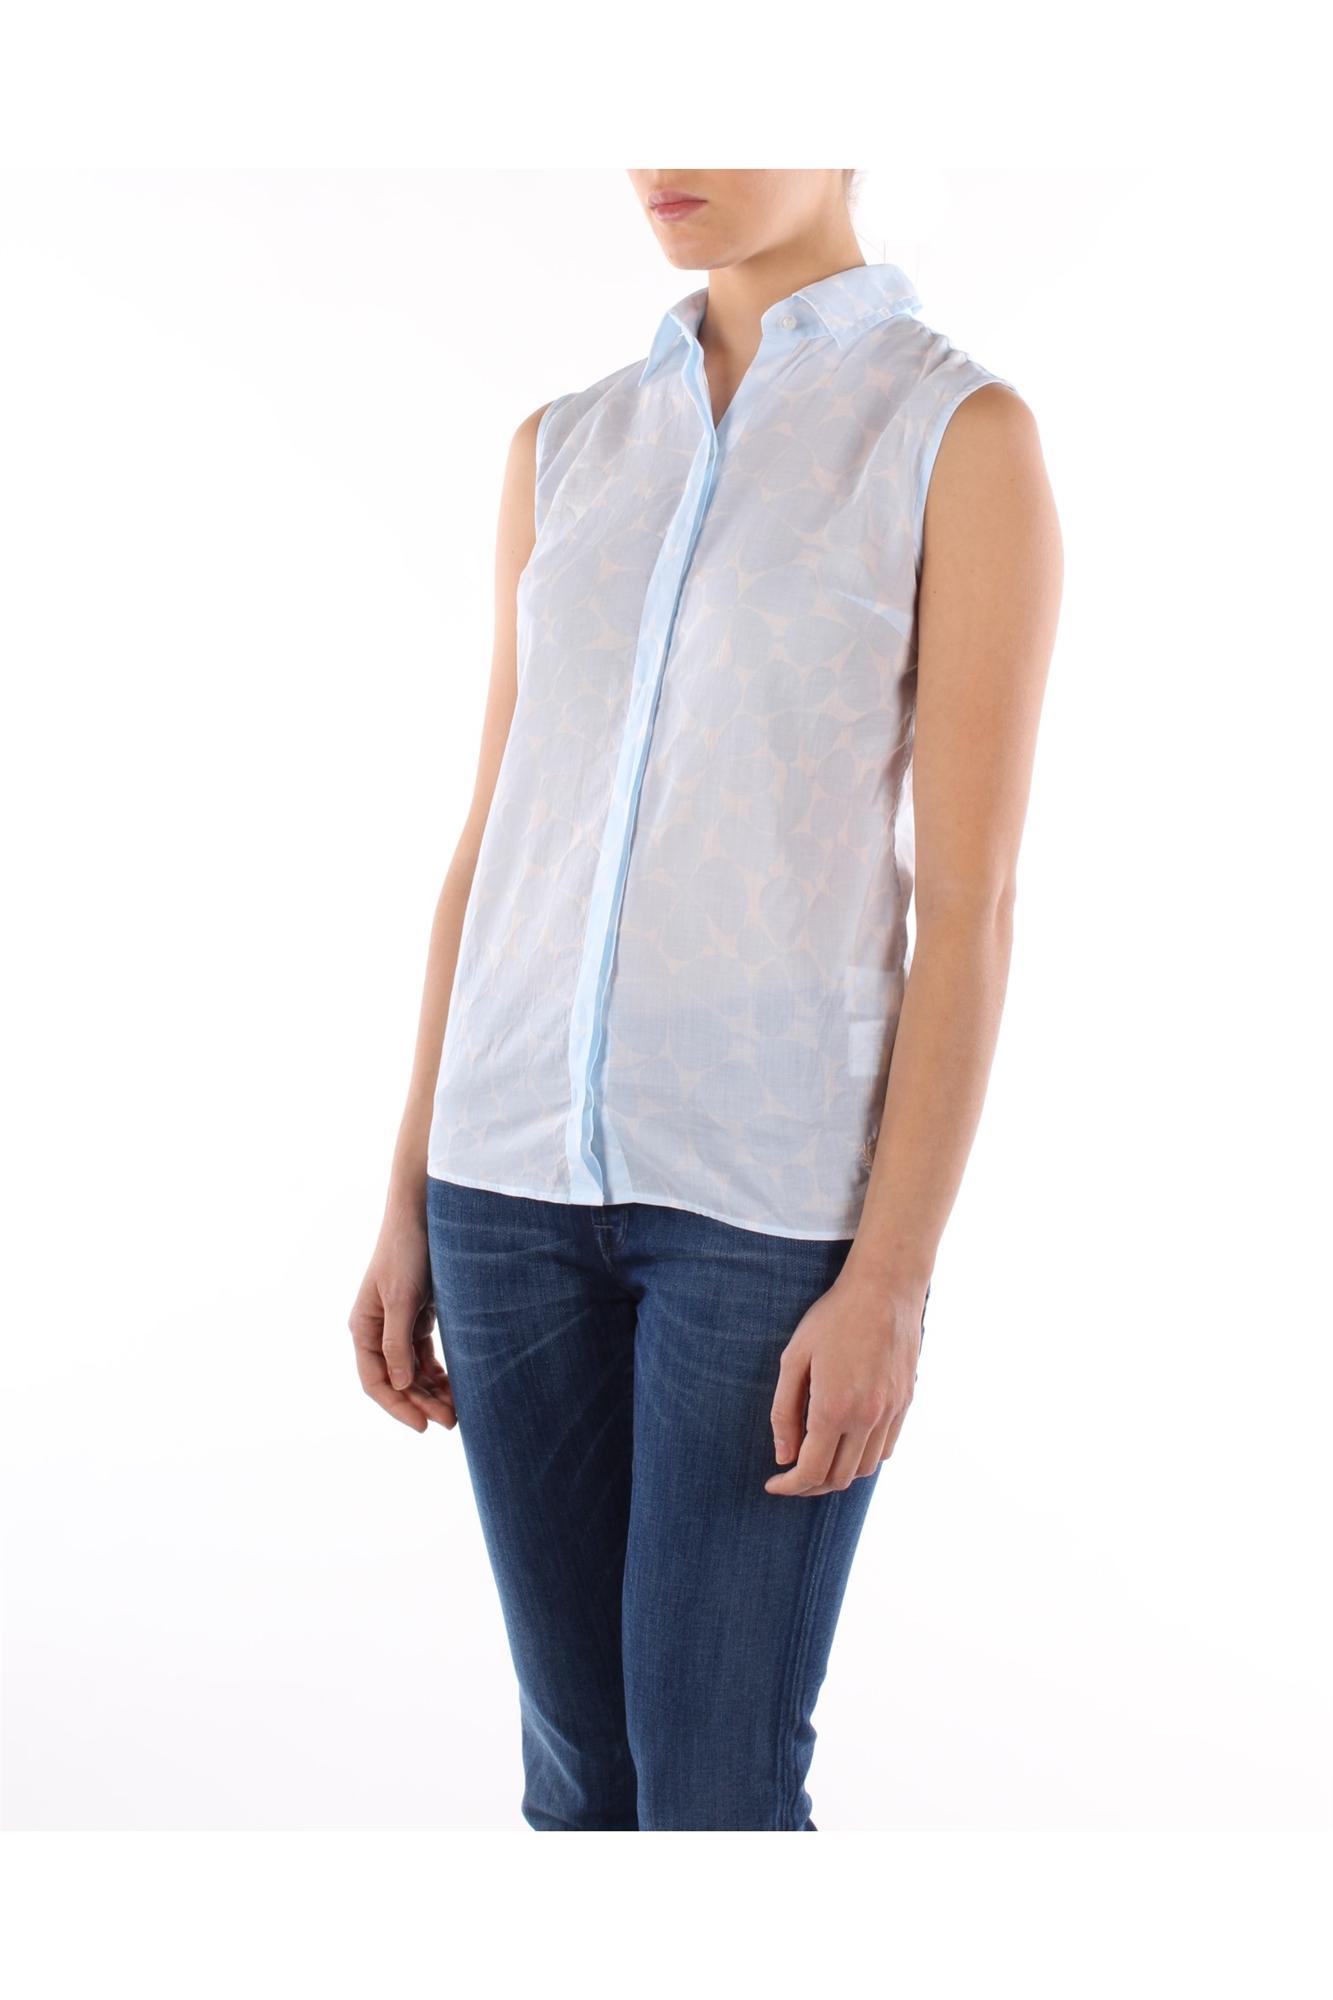 Shirts Fred Perry Women Cotton Light blue 31222179V0031 | eBay